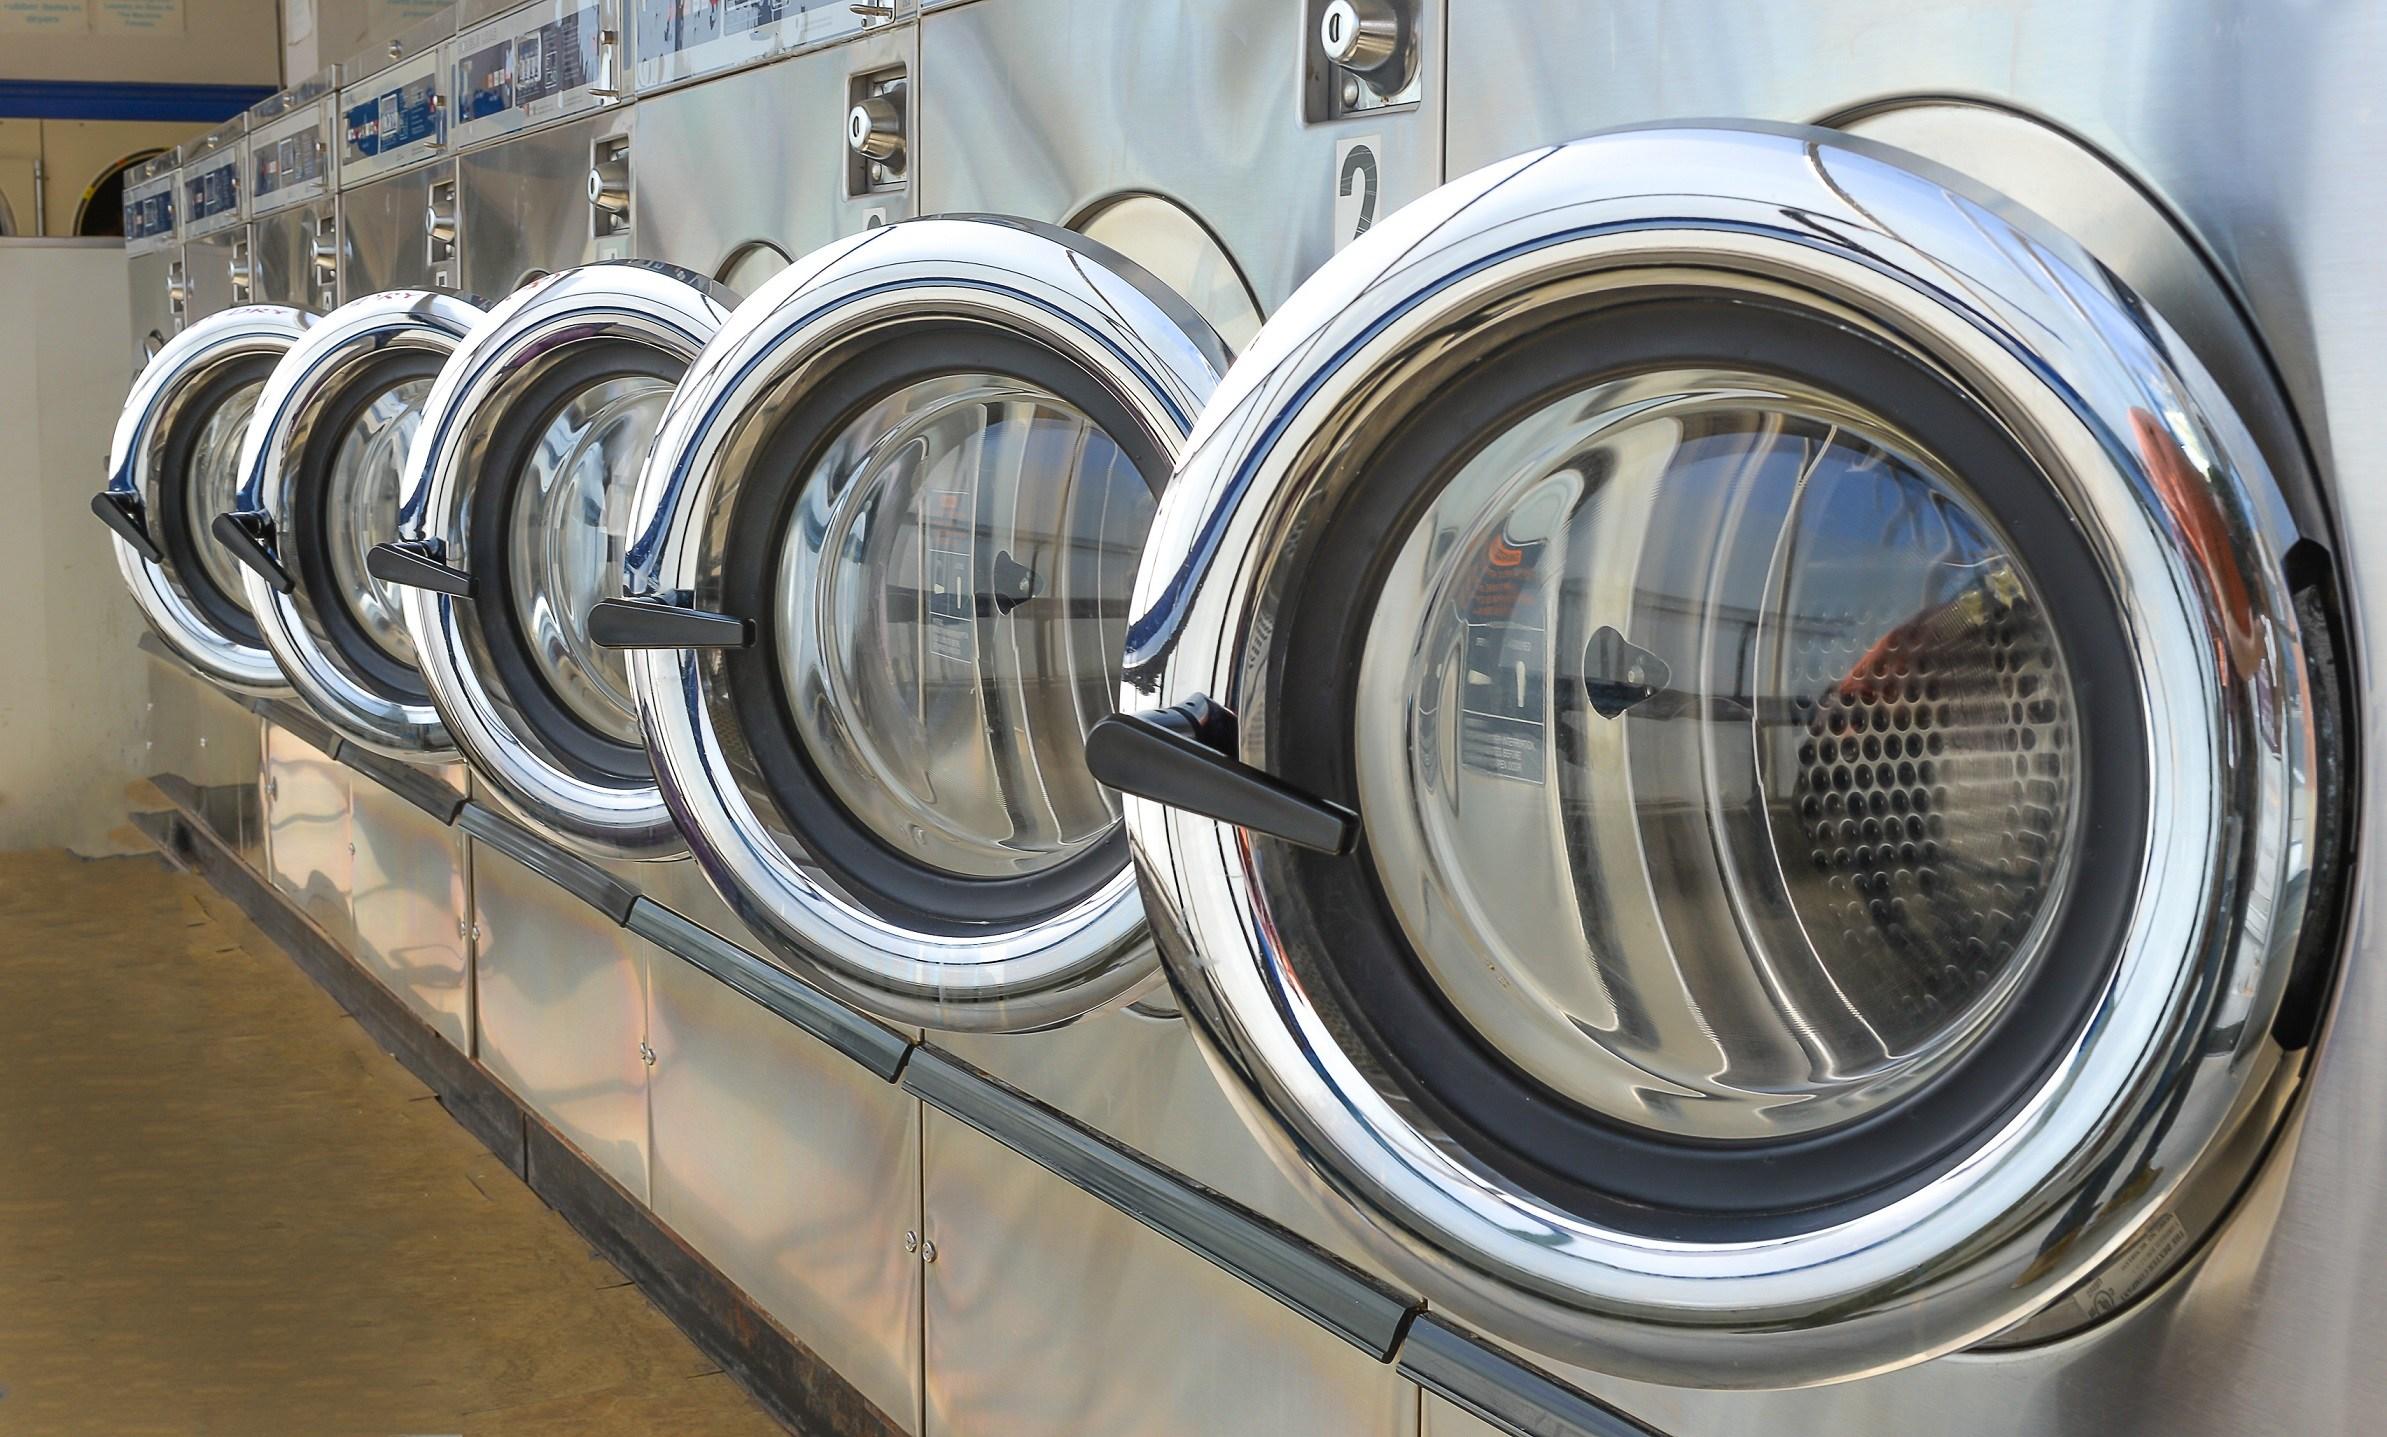 Laundromat for doing laundry